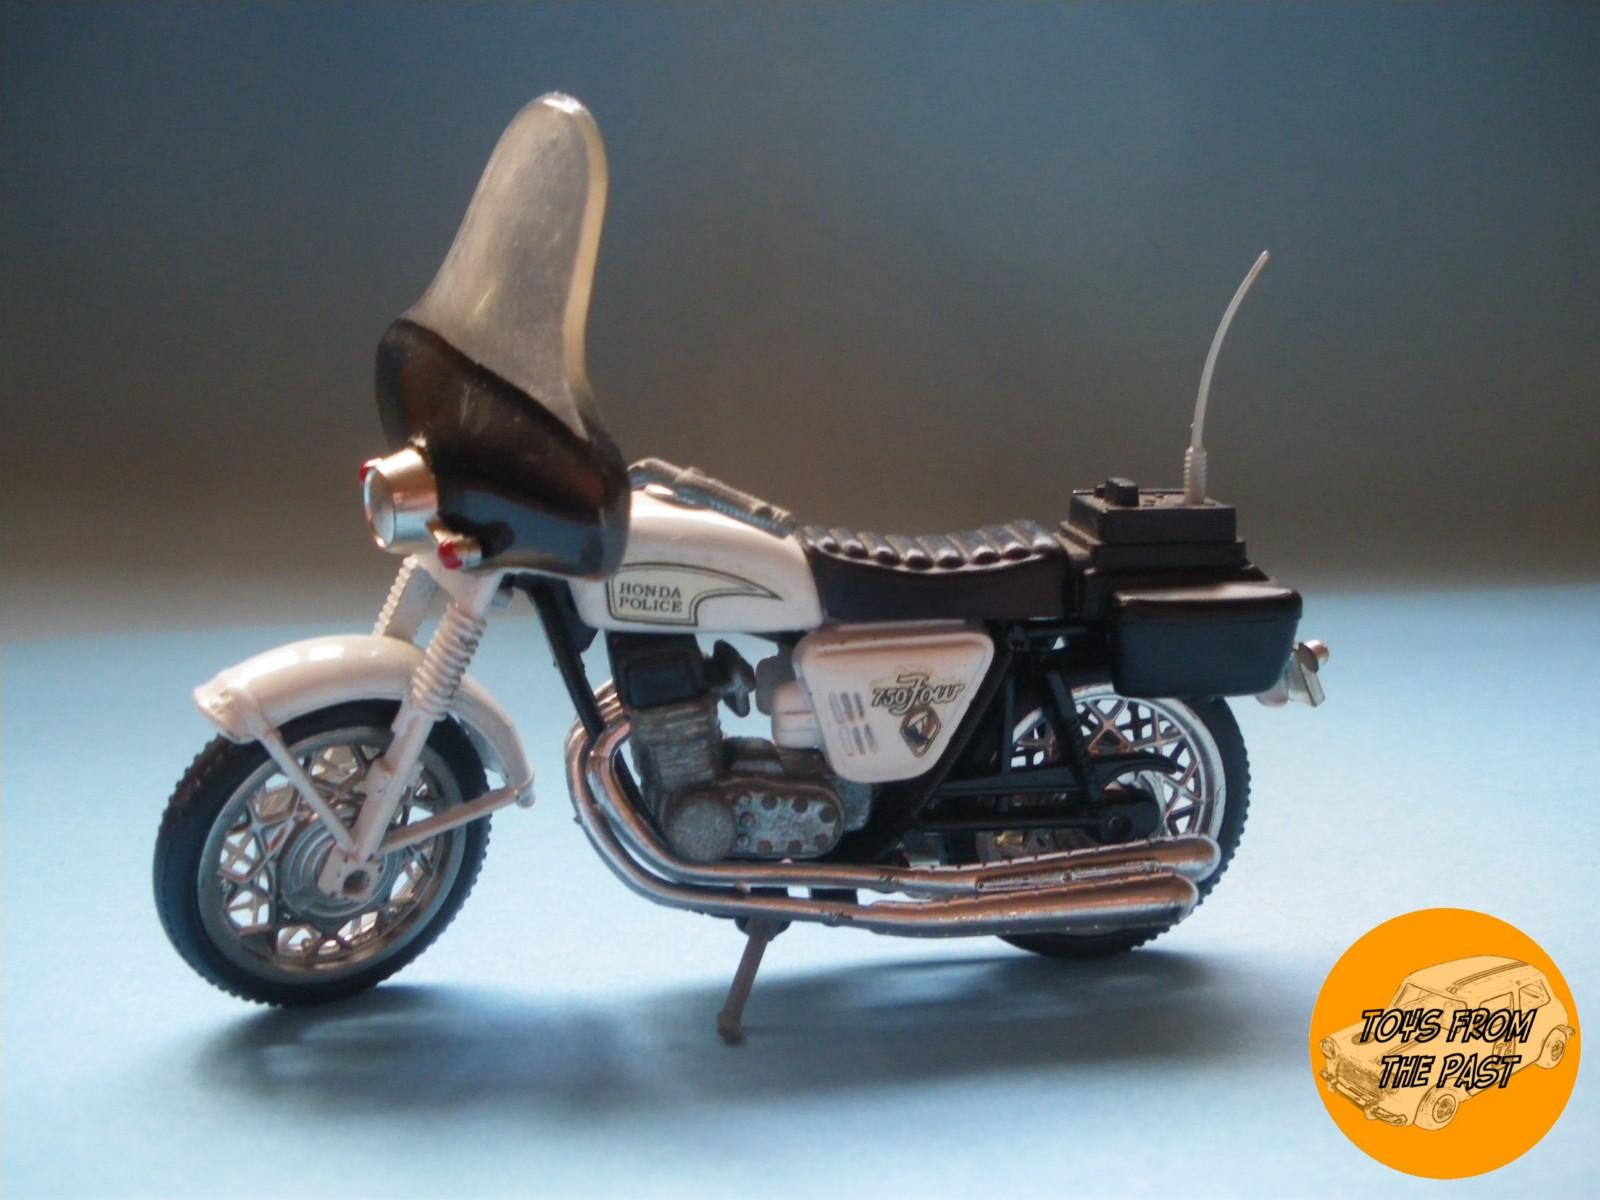 Diecast Motorcycles Honda Shadow